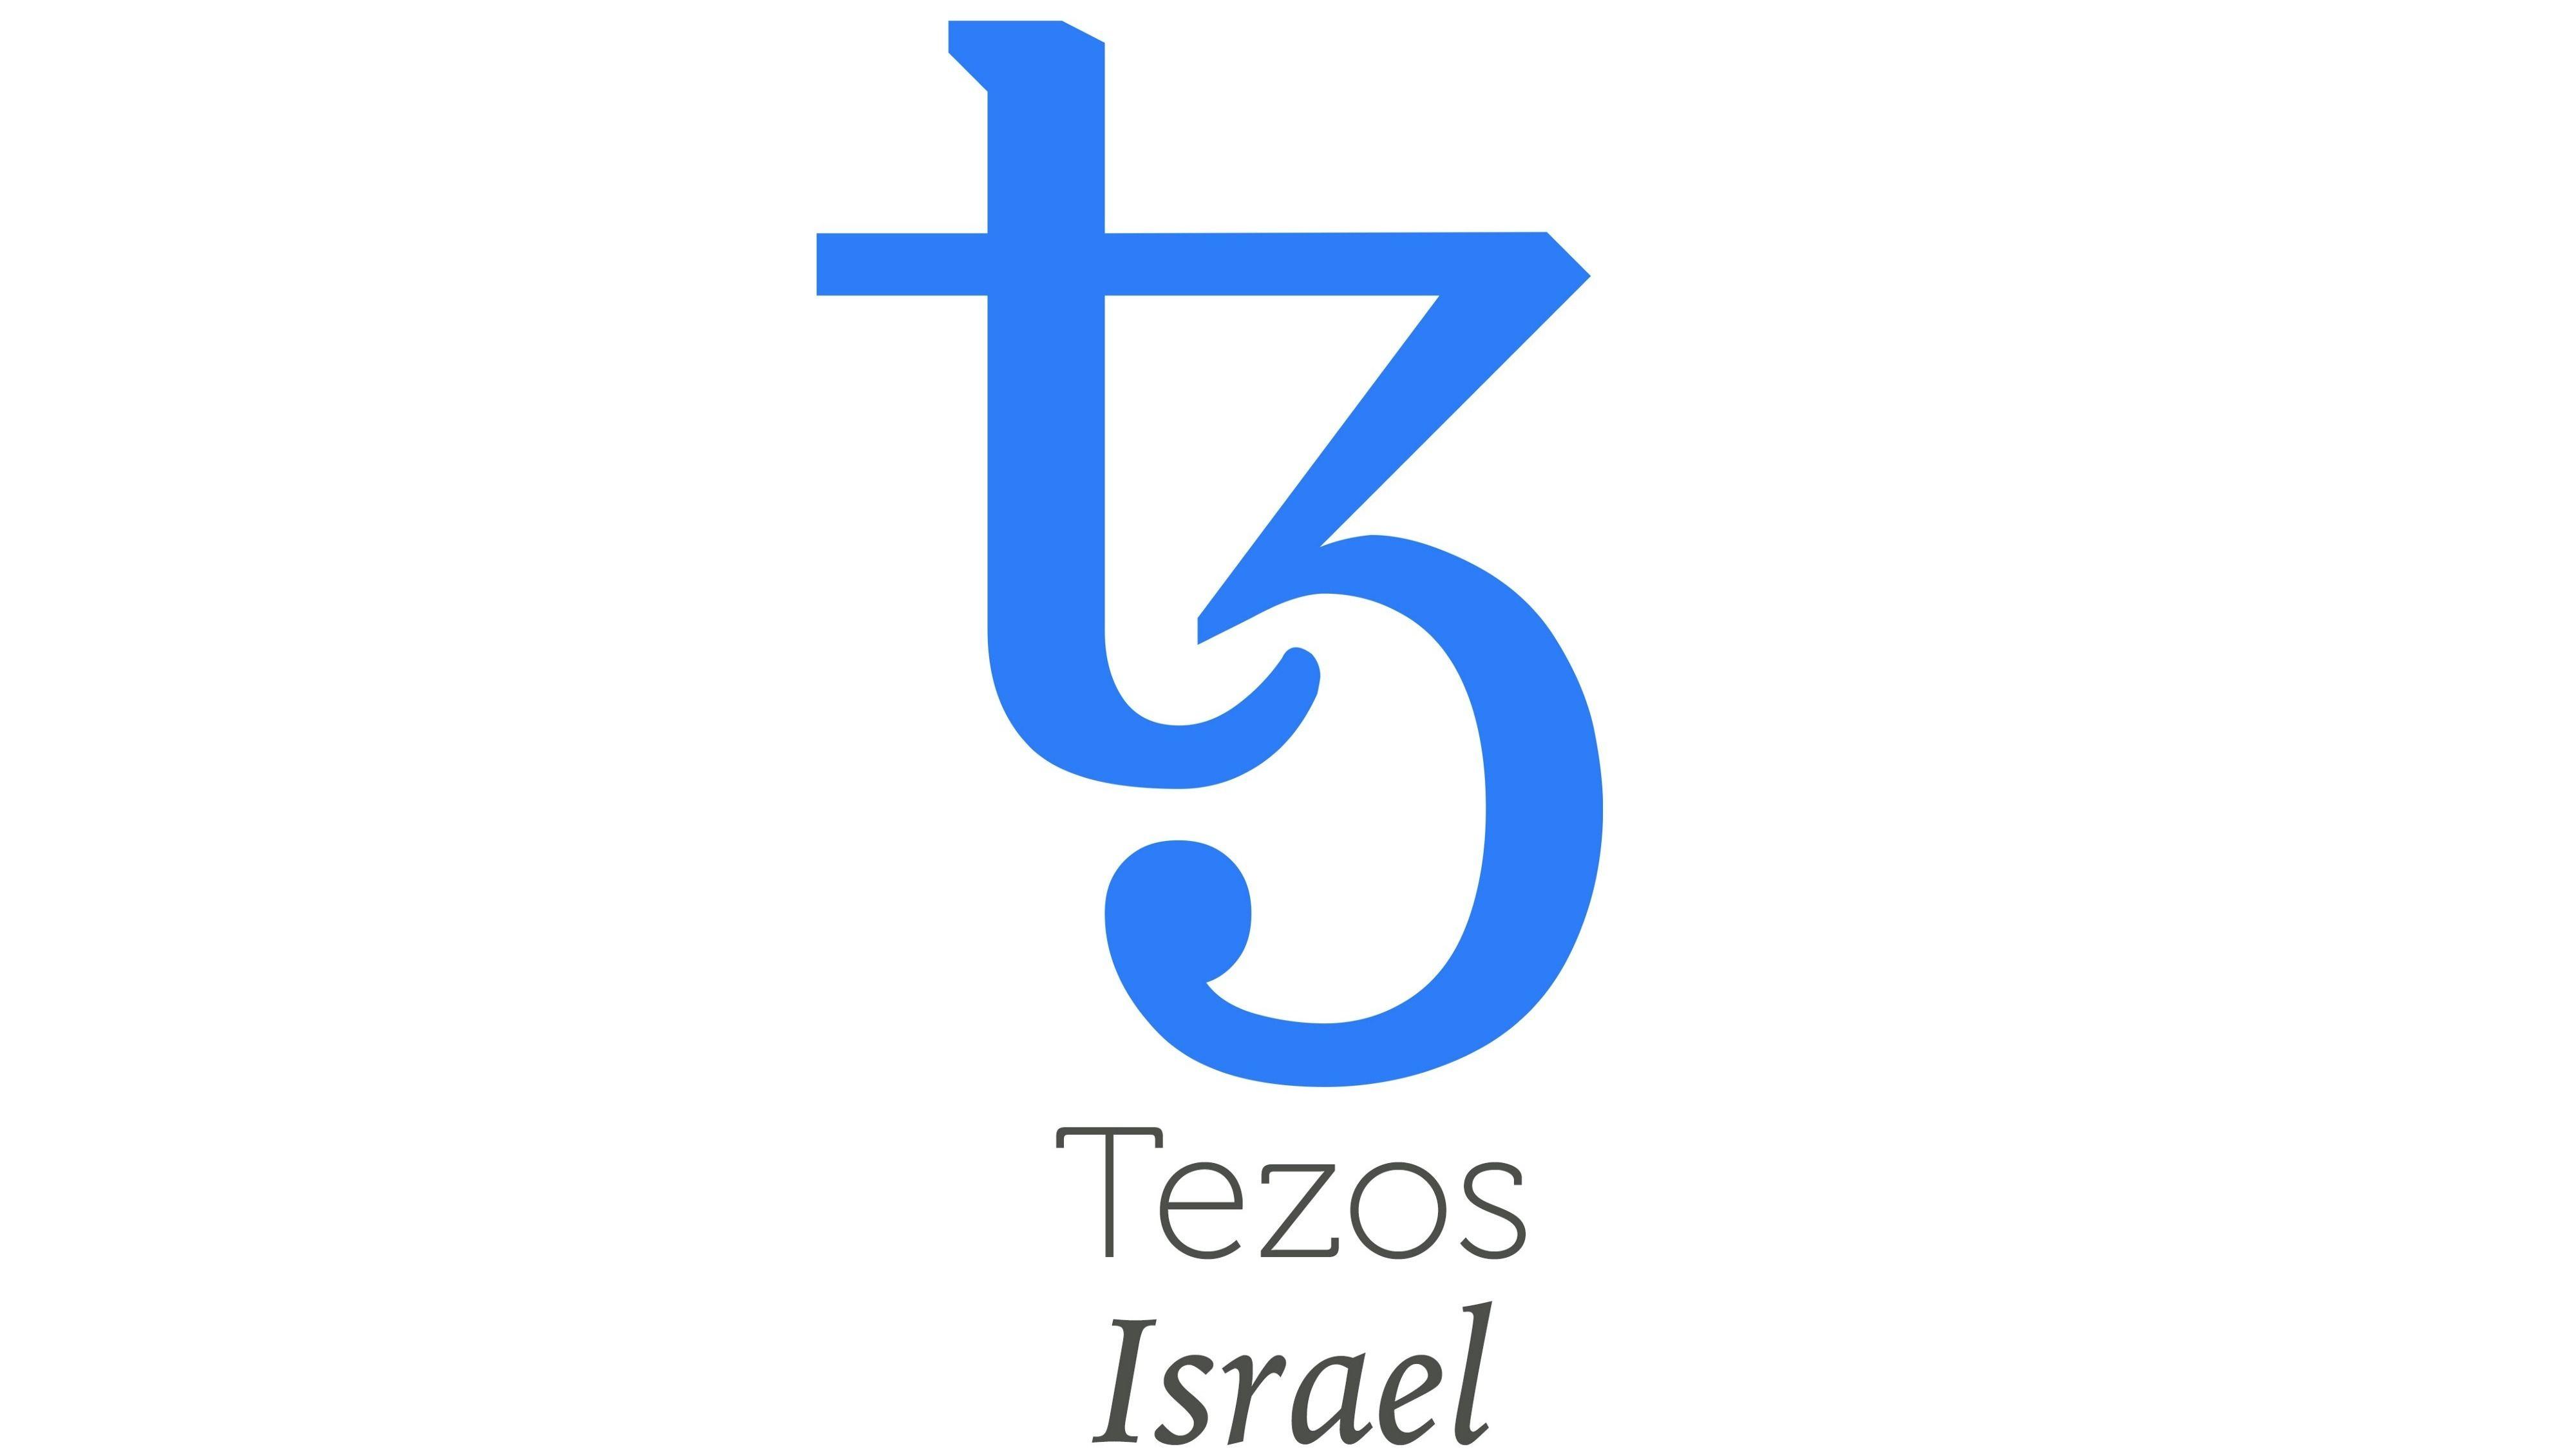 Tezos Israel